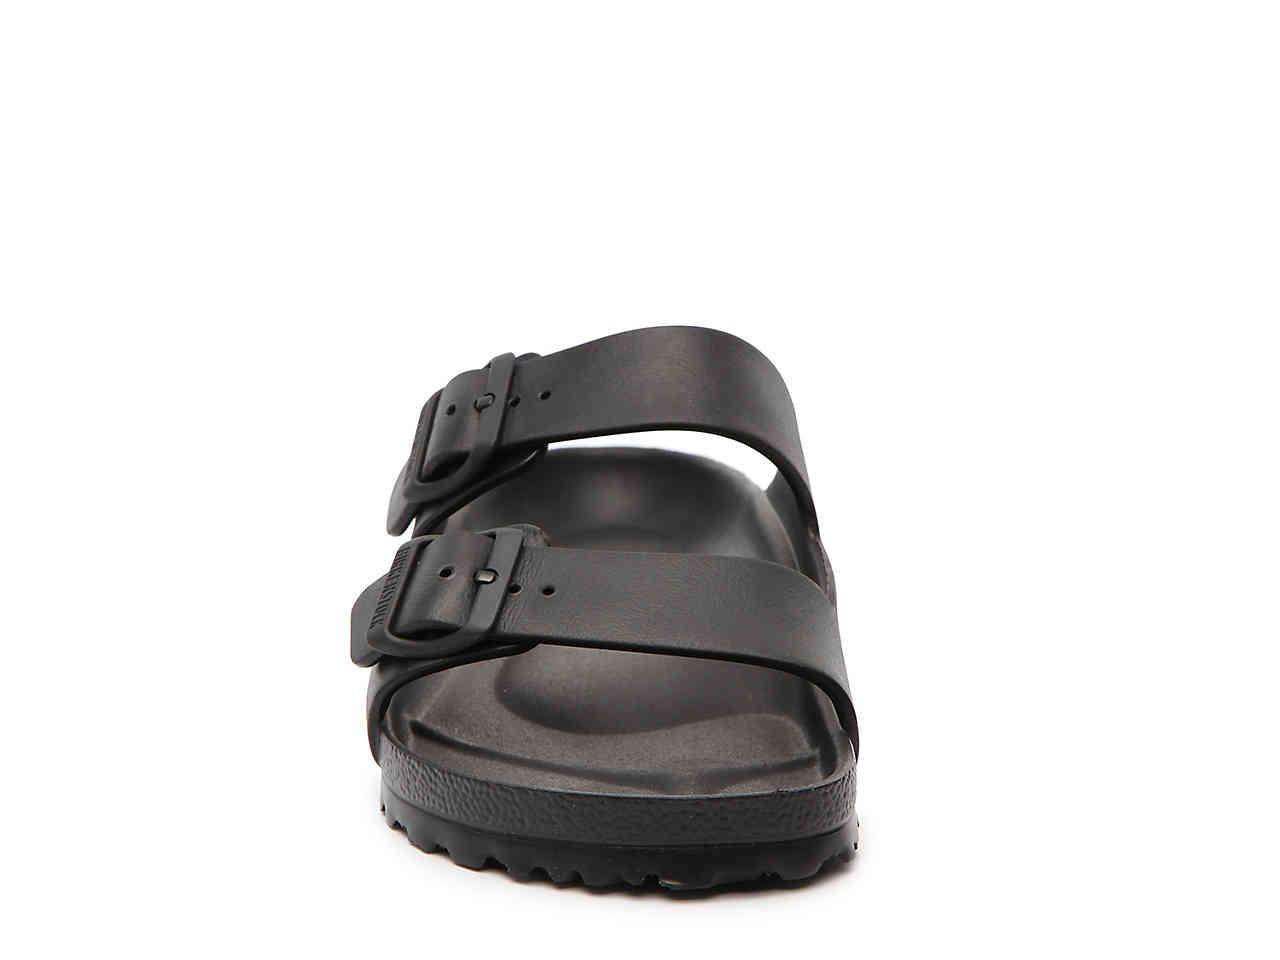 6d693bc939d3 Birkenstock - Black Essentials Arizona Slide Sandal for Men - Lyst. View  fullscreen